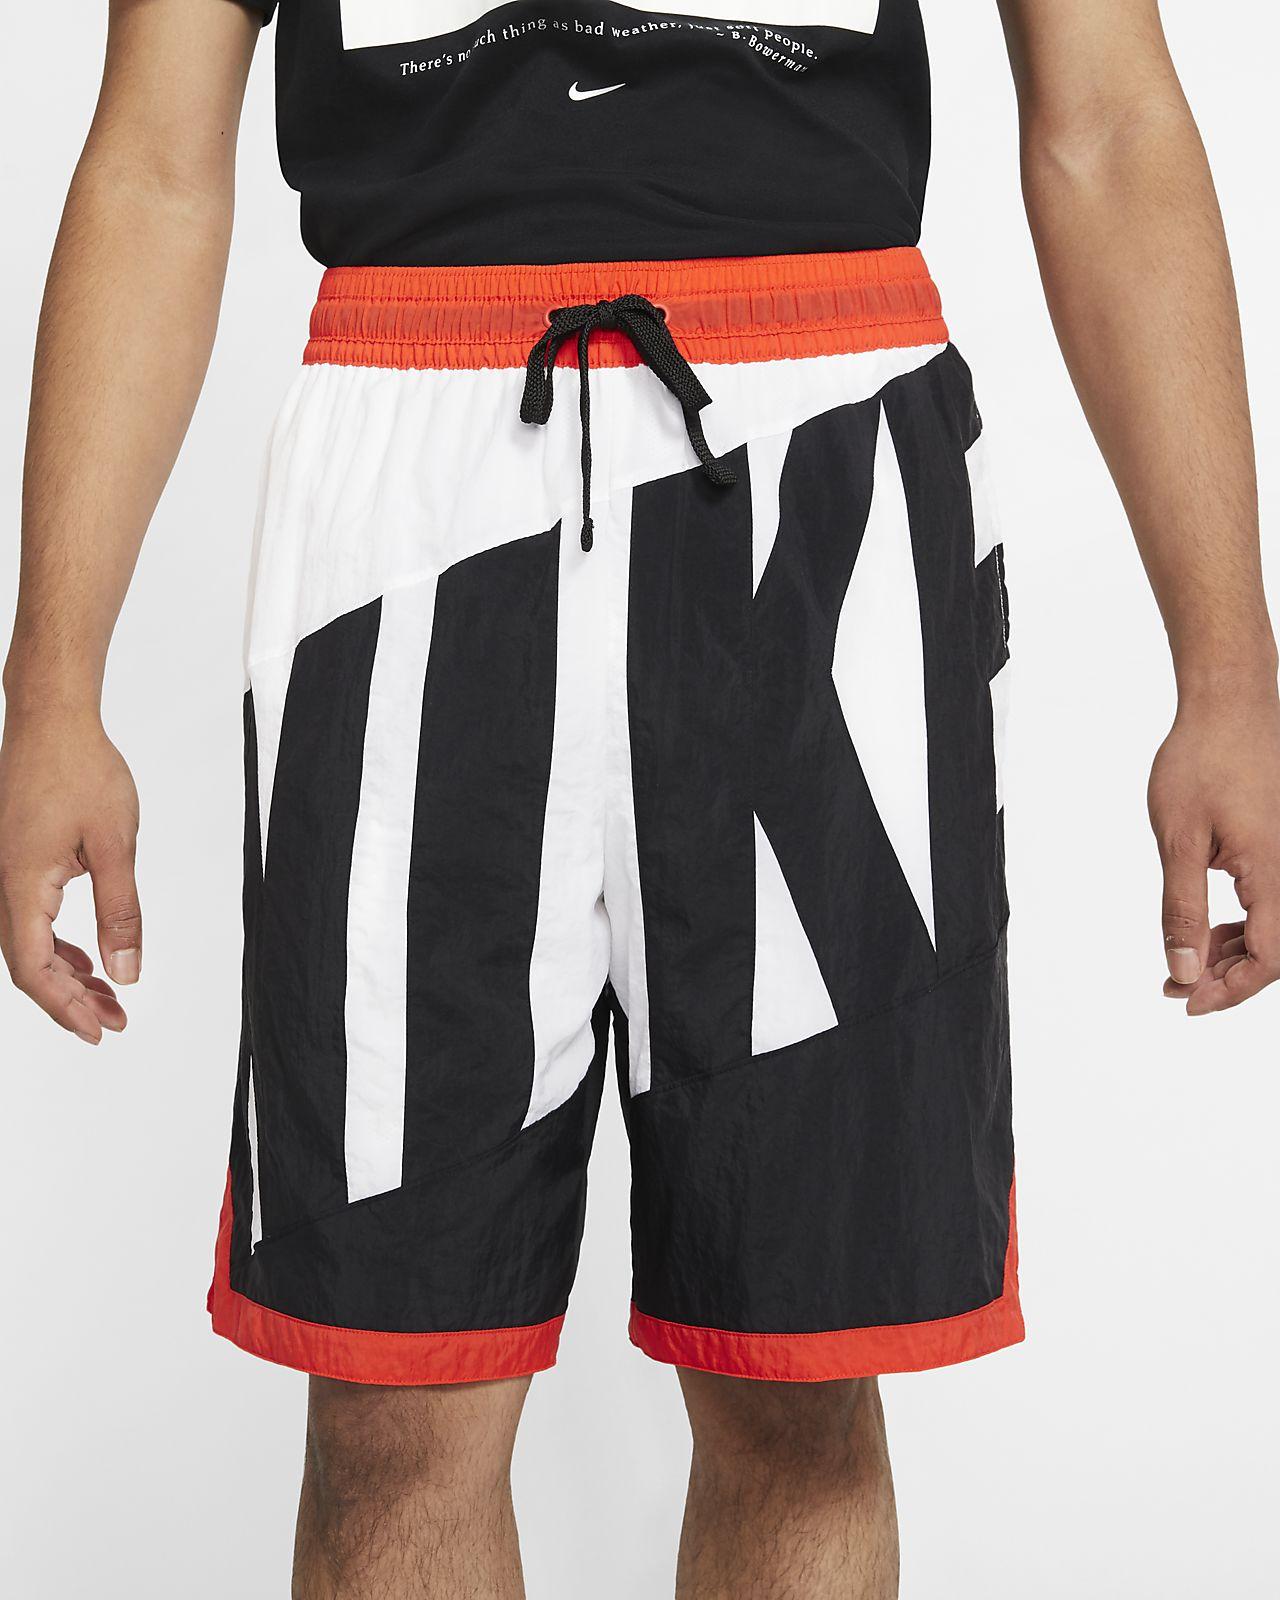 Nike Dri-FIT Throwback Basketball Shorts